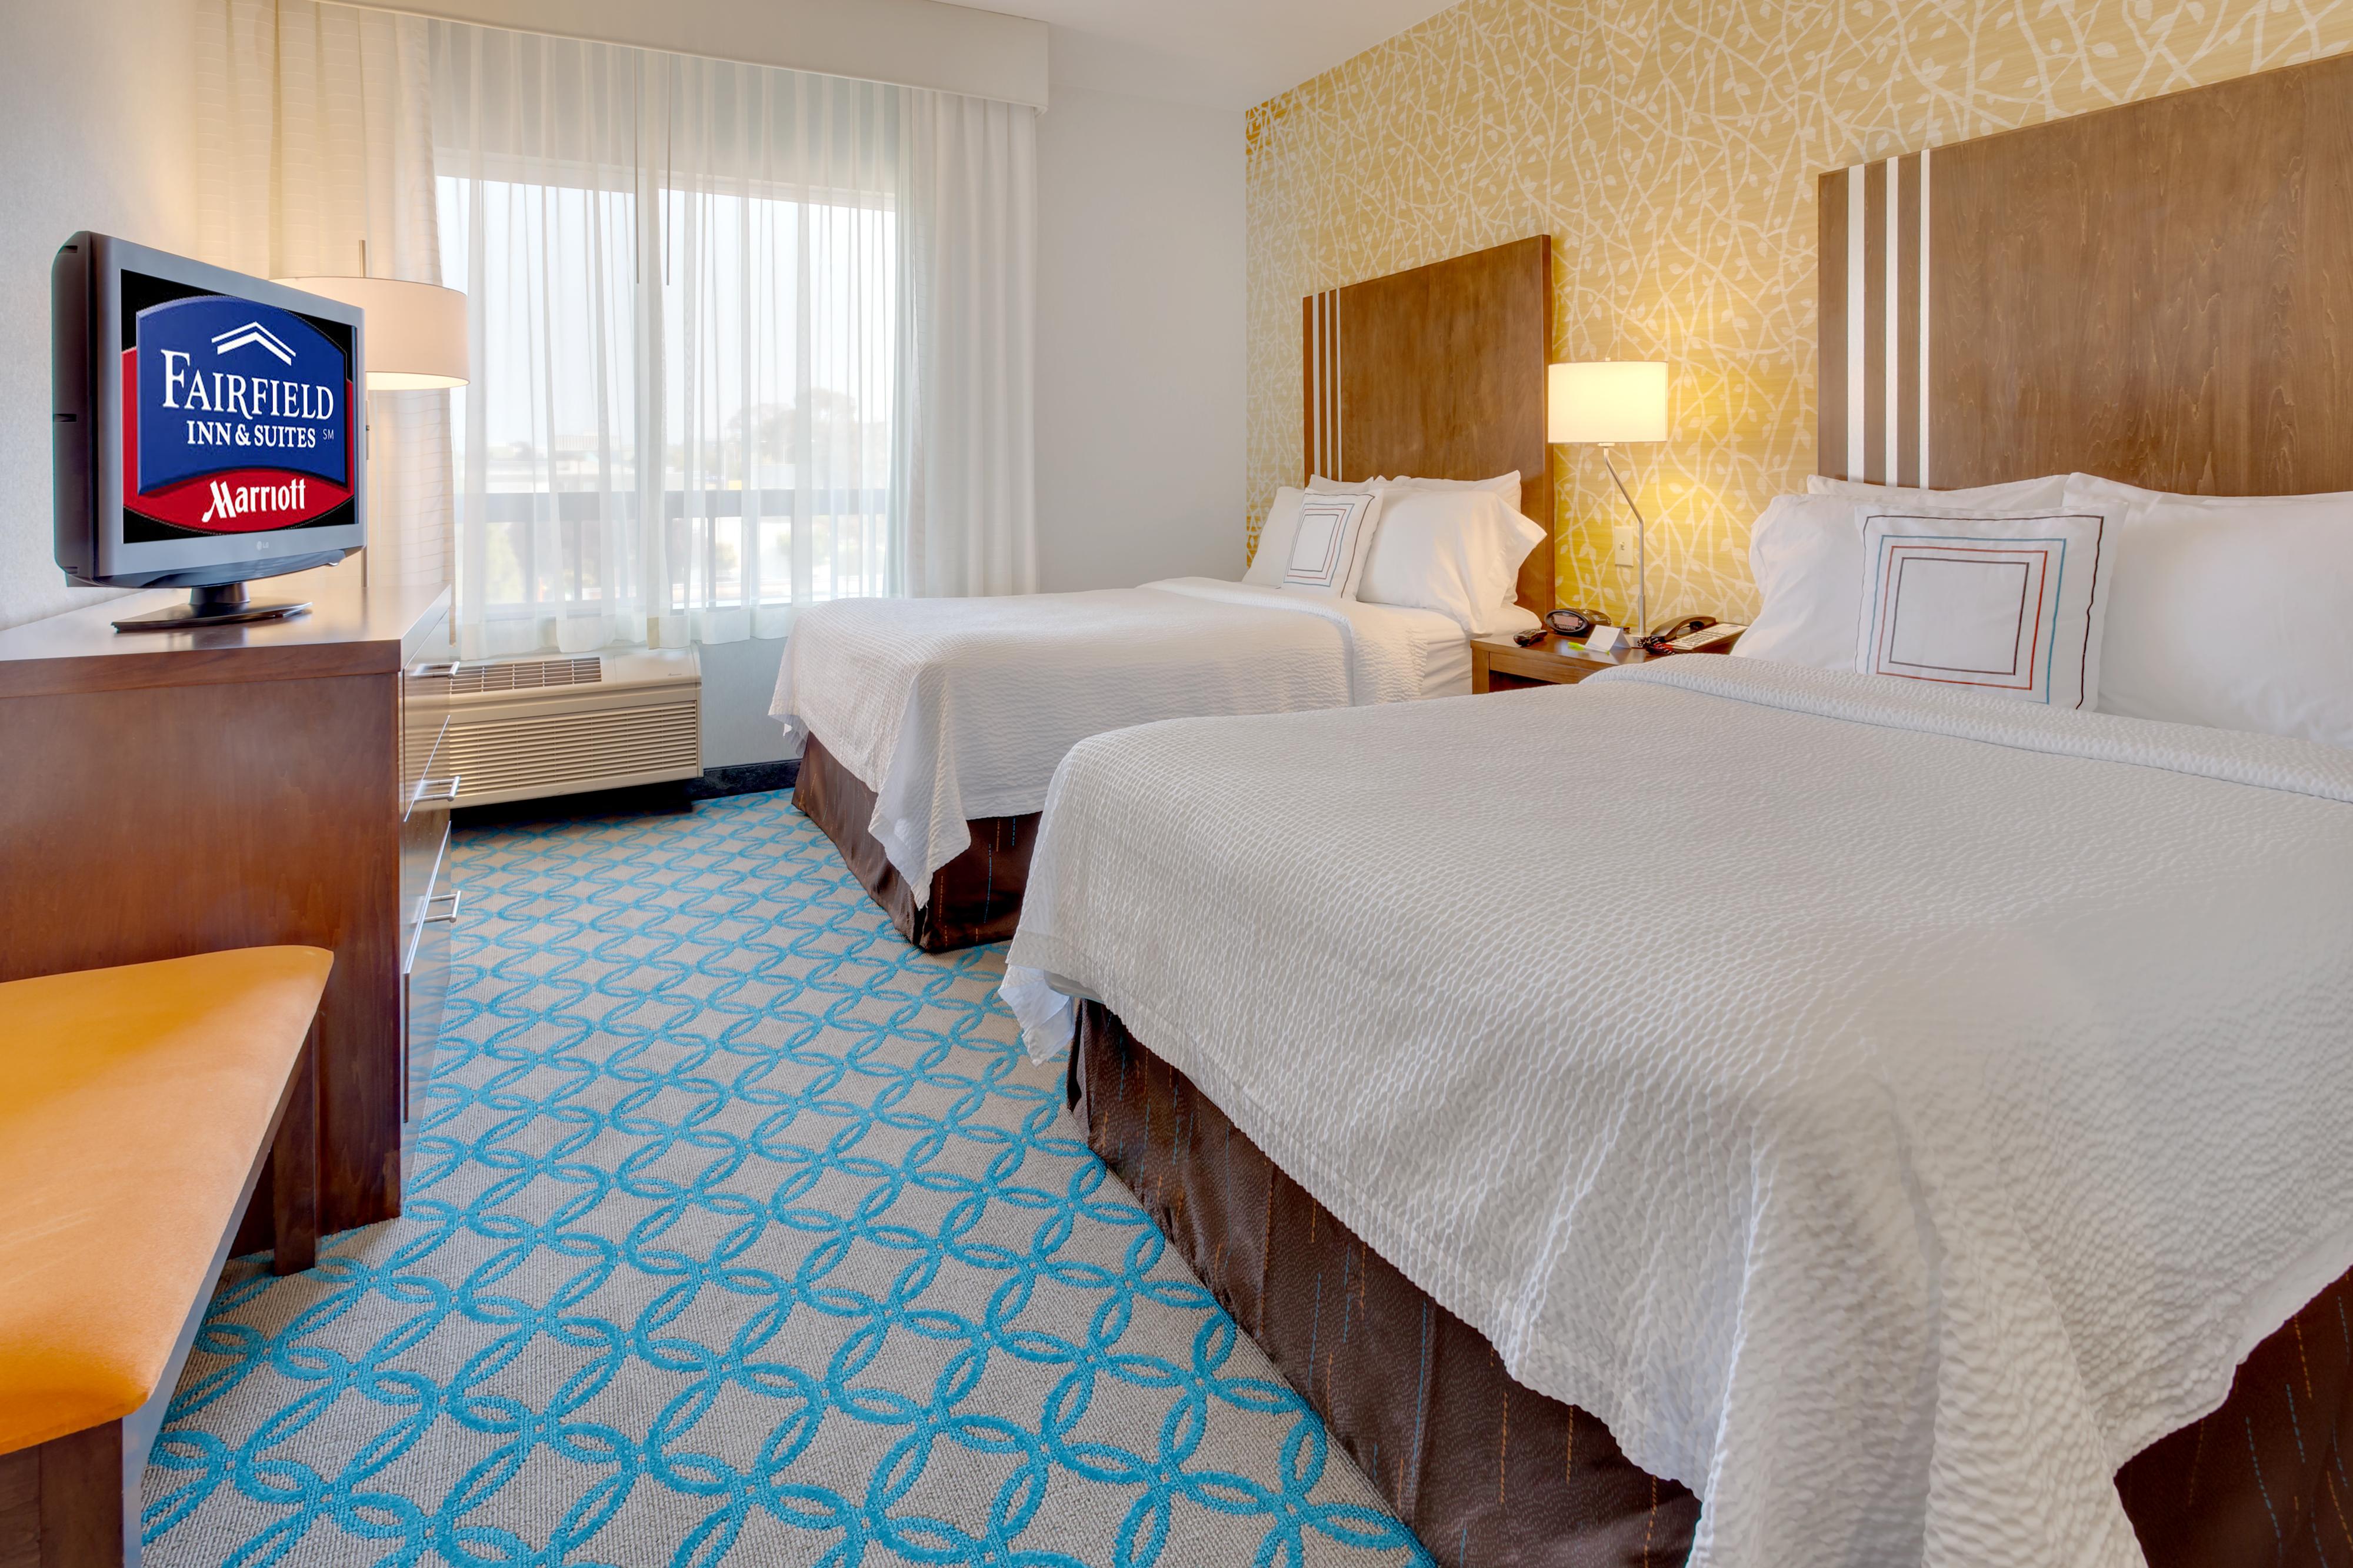 https://www.hotelsbyday.com/_data/default-hotel_image/1/6277/sfome-standard-double-quuens-sleeping-area-view.jpg